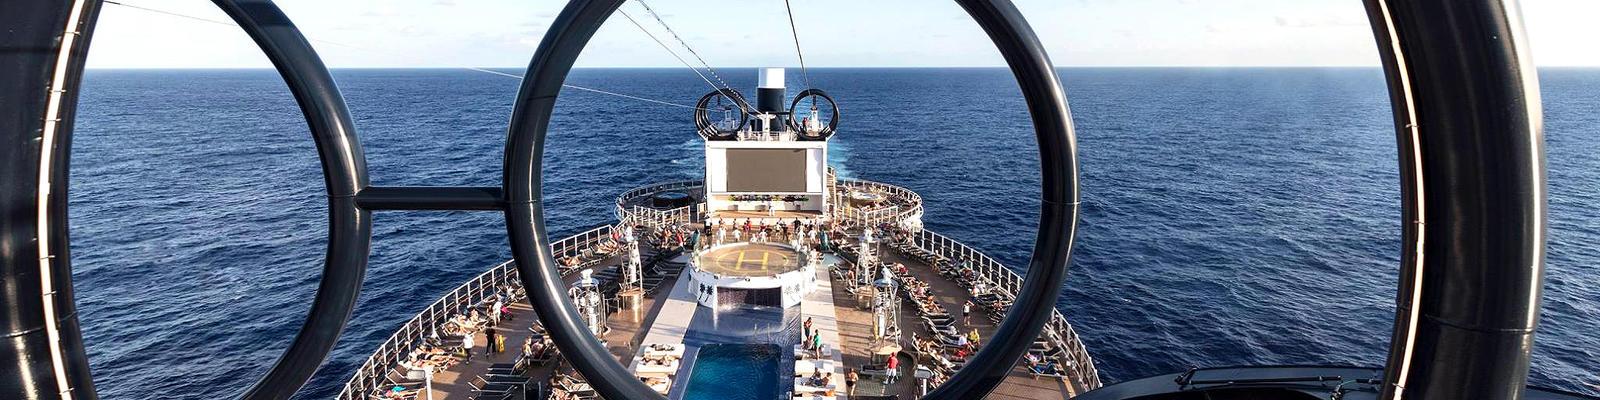 MSC Cruises' Seaside-Class Ziplines (Photo: MSC Cruises)